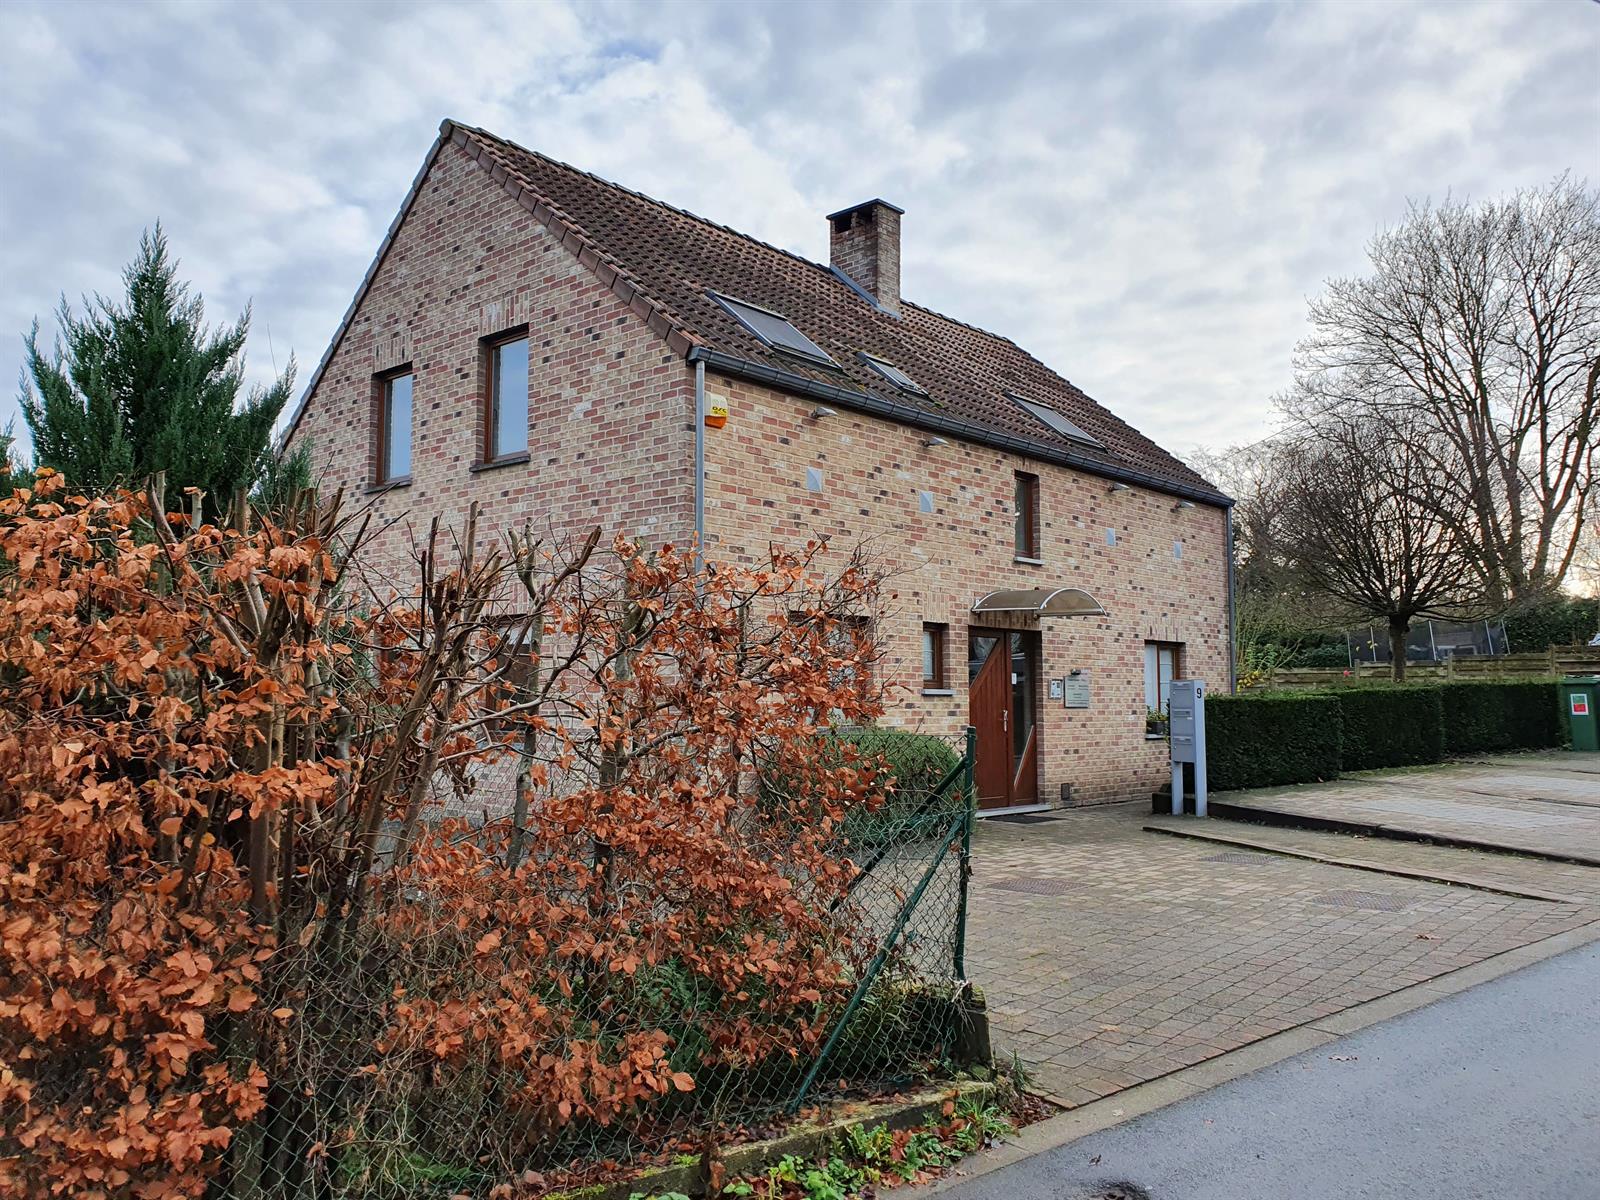 Appartement - Chaumont-Gistoux - #4226214-10